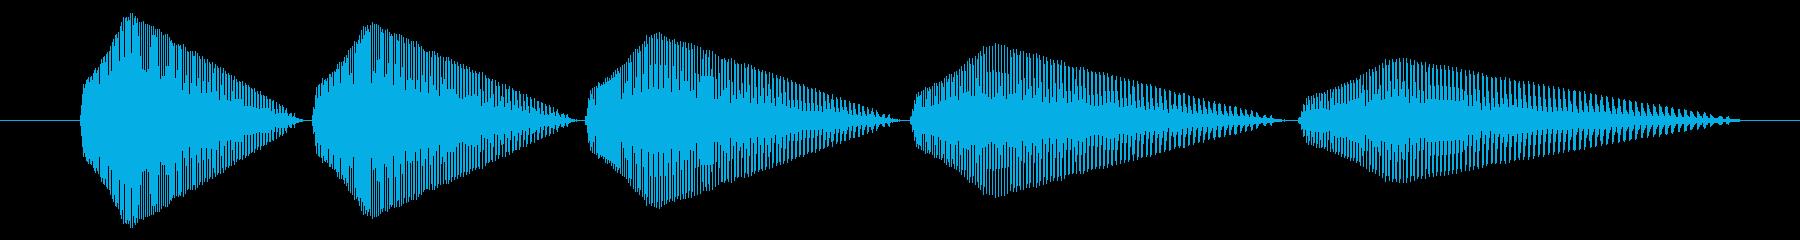 SNES-アクション01-13(倒す)の再生済みの波形